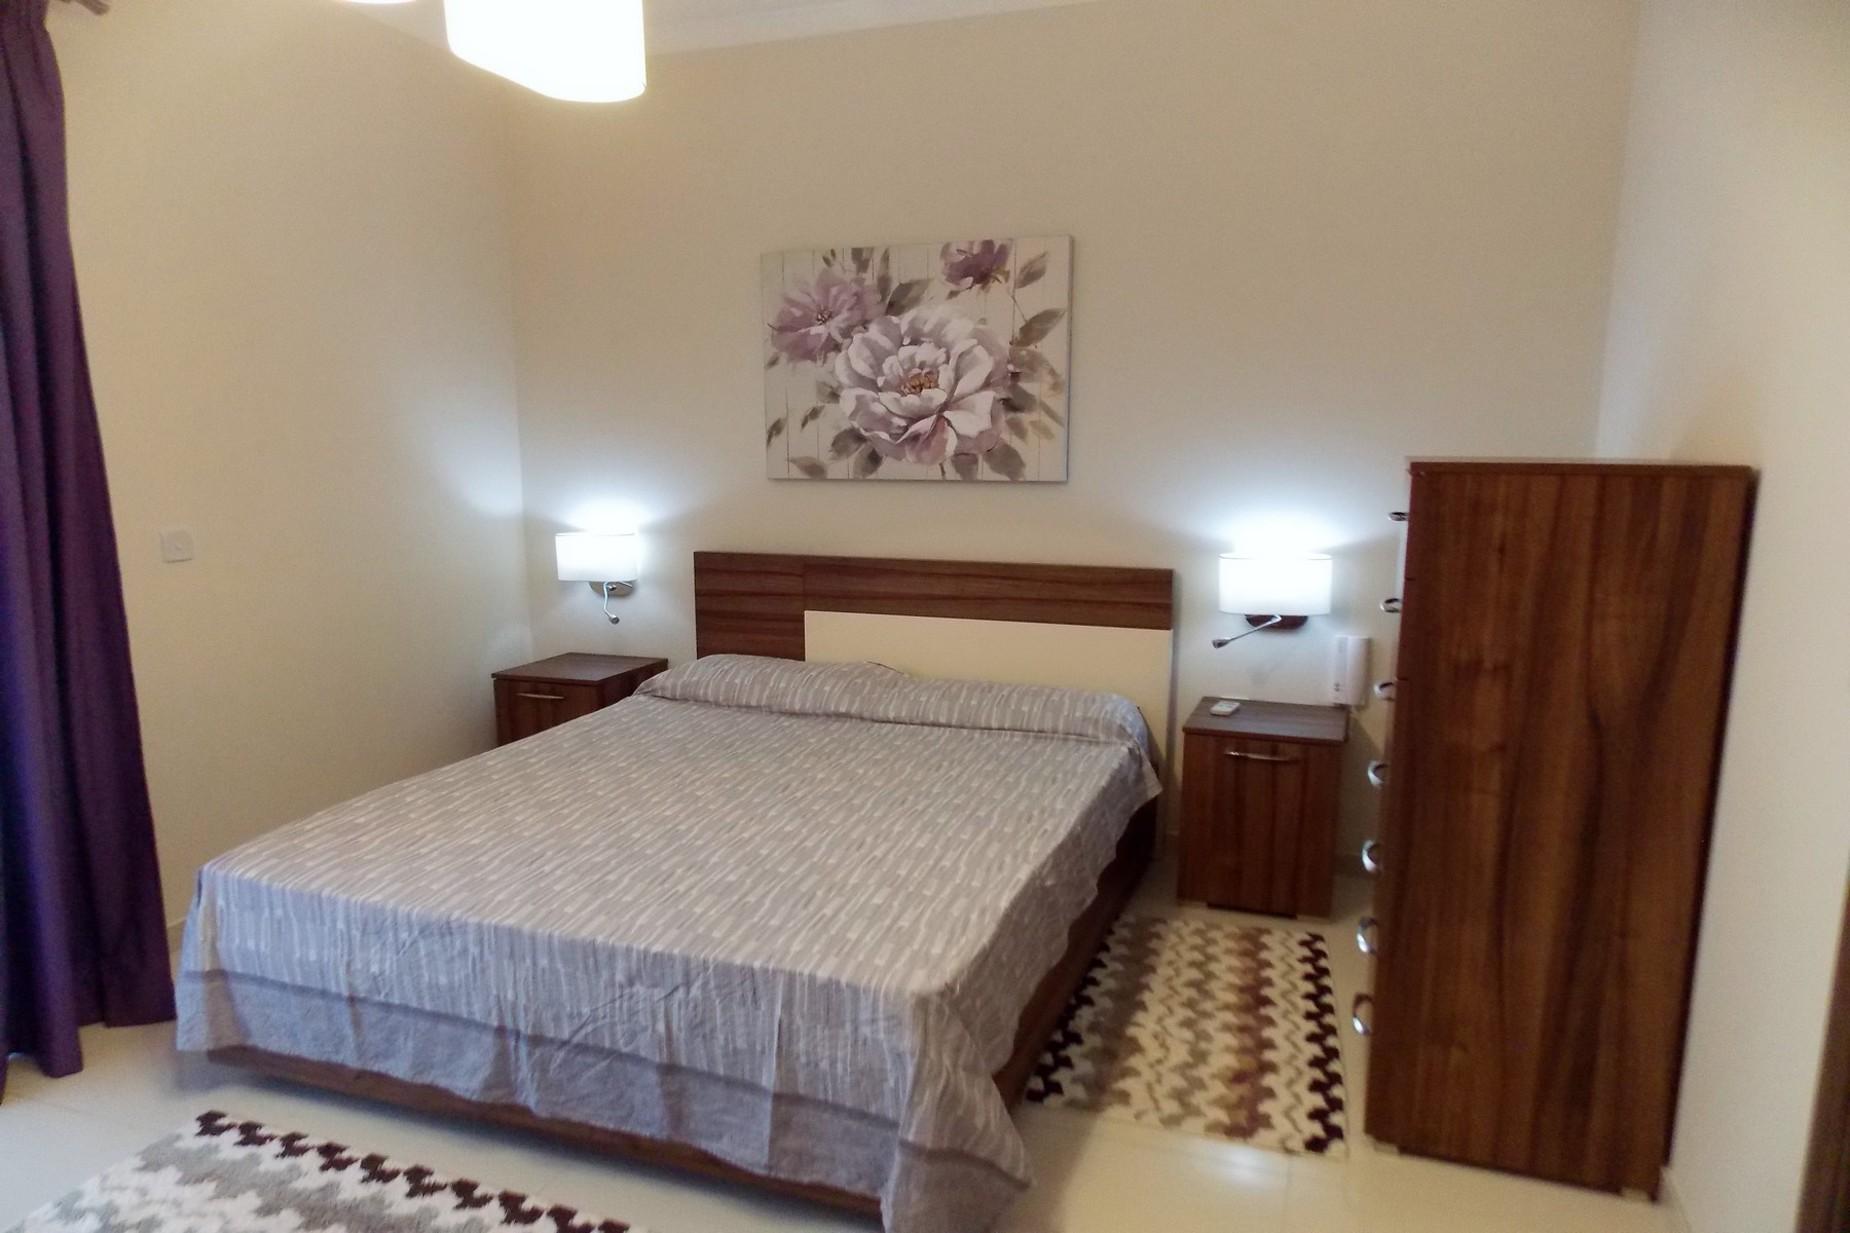 2 bed Terraced House For Rent in Marsascala, Marsascala - thumb 9